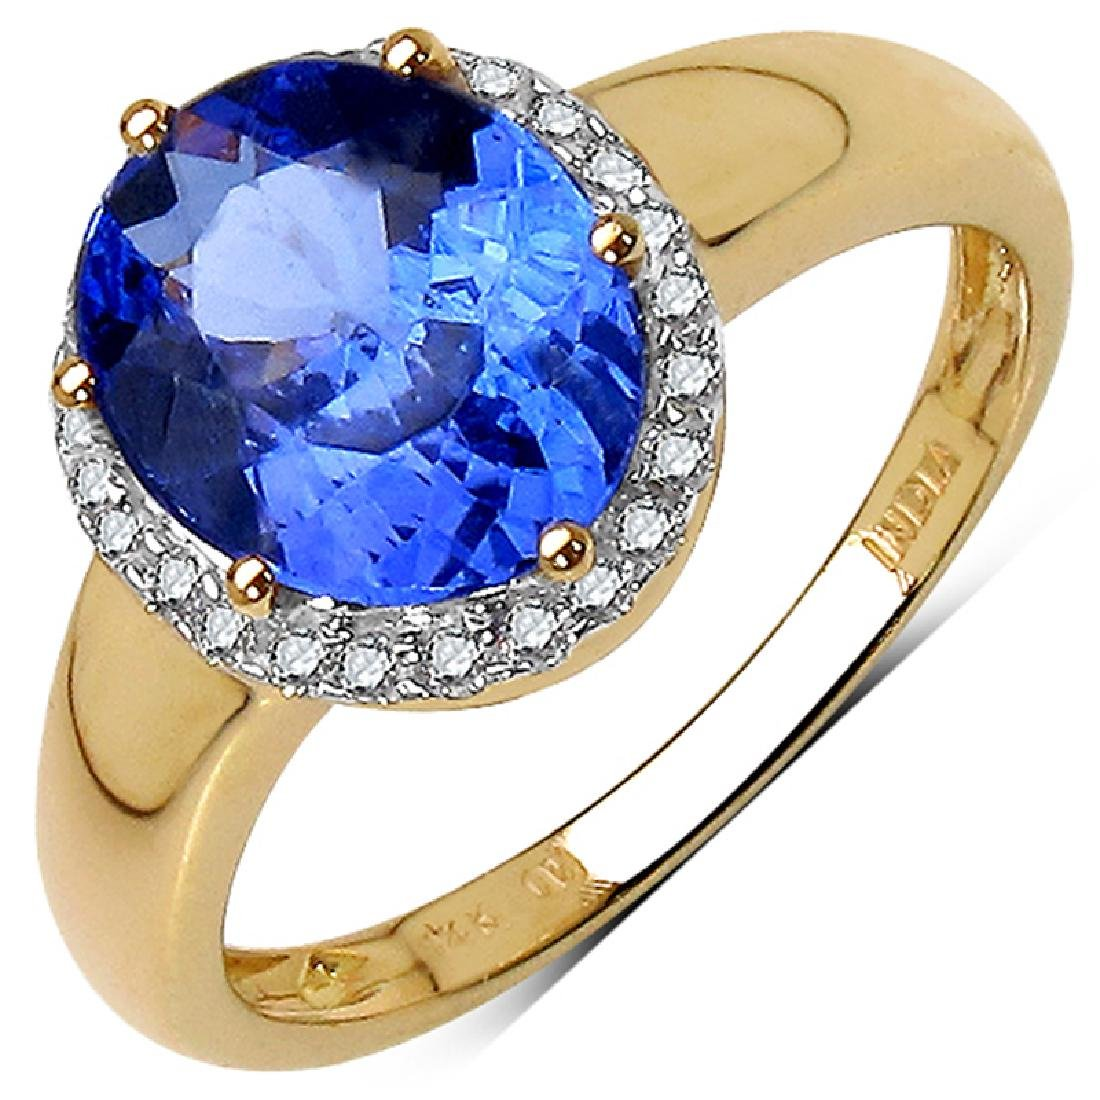 APP: 5k *Fine Jewelry 14 kt. White/Yellow Gold, 2.60CT